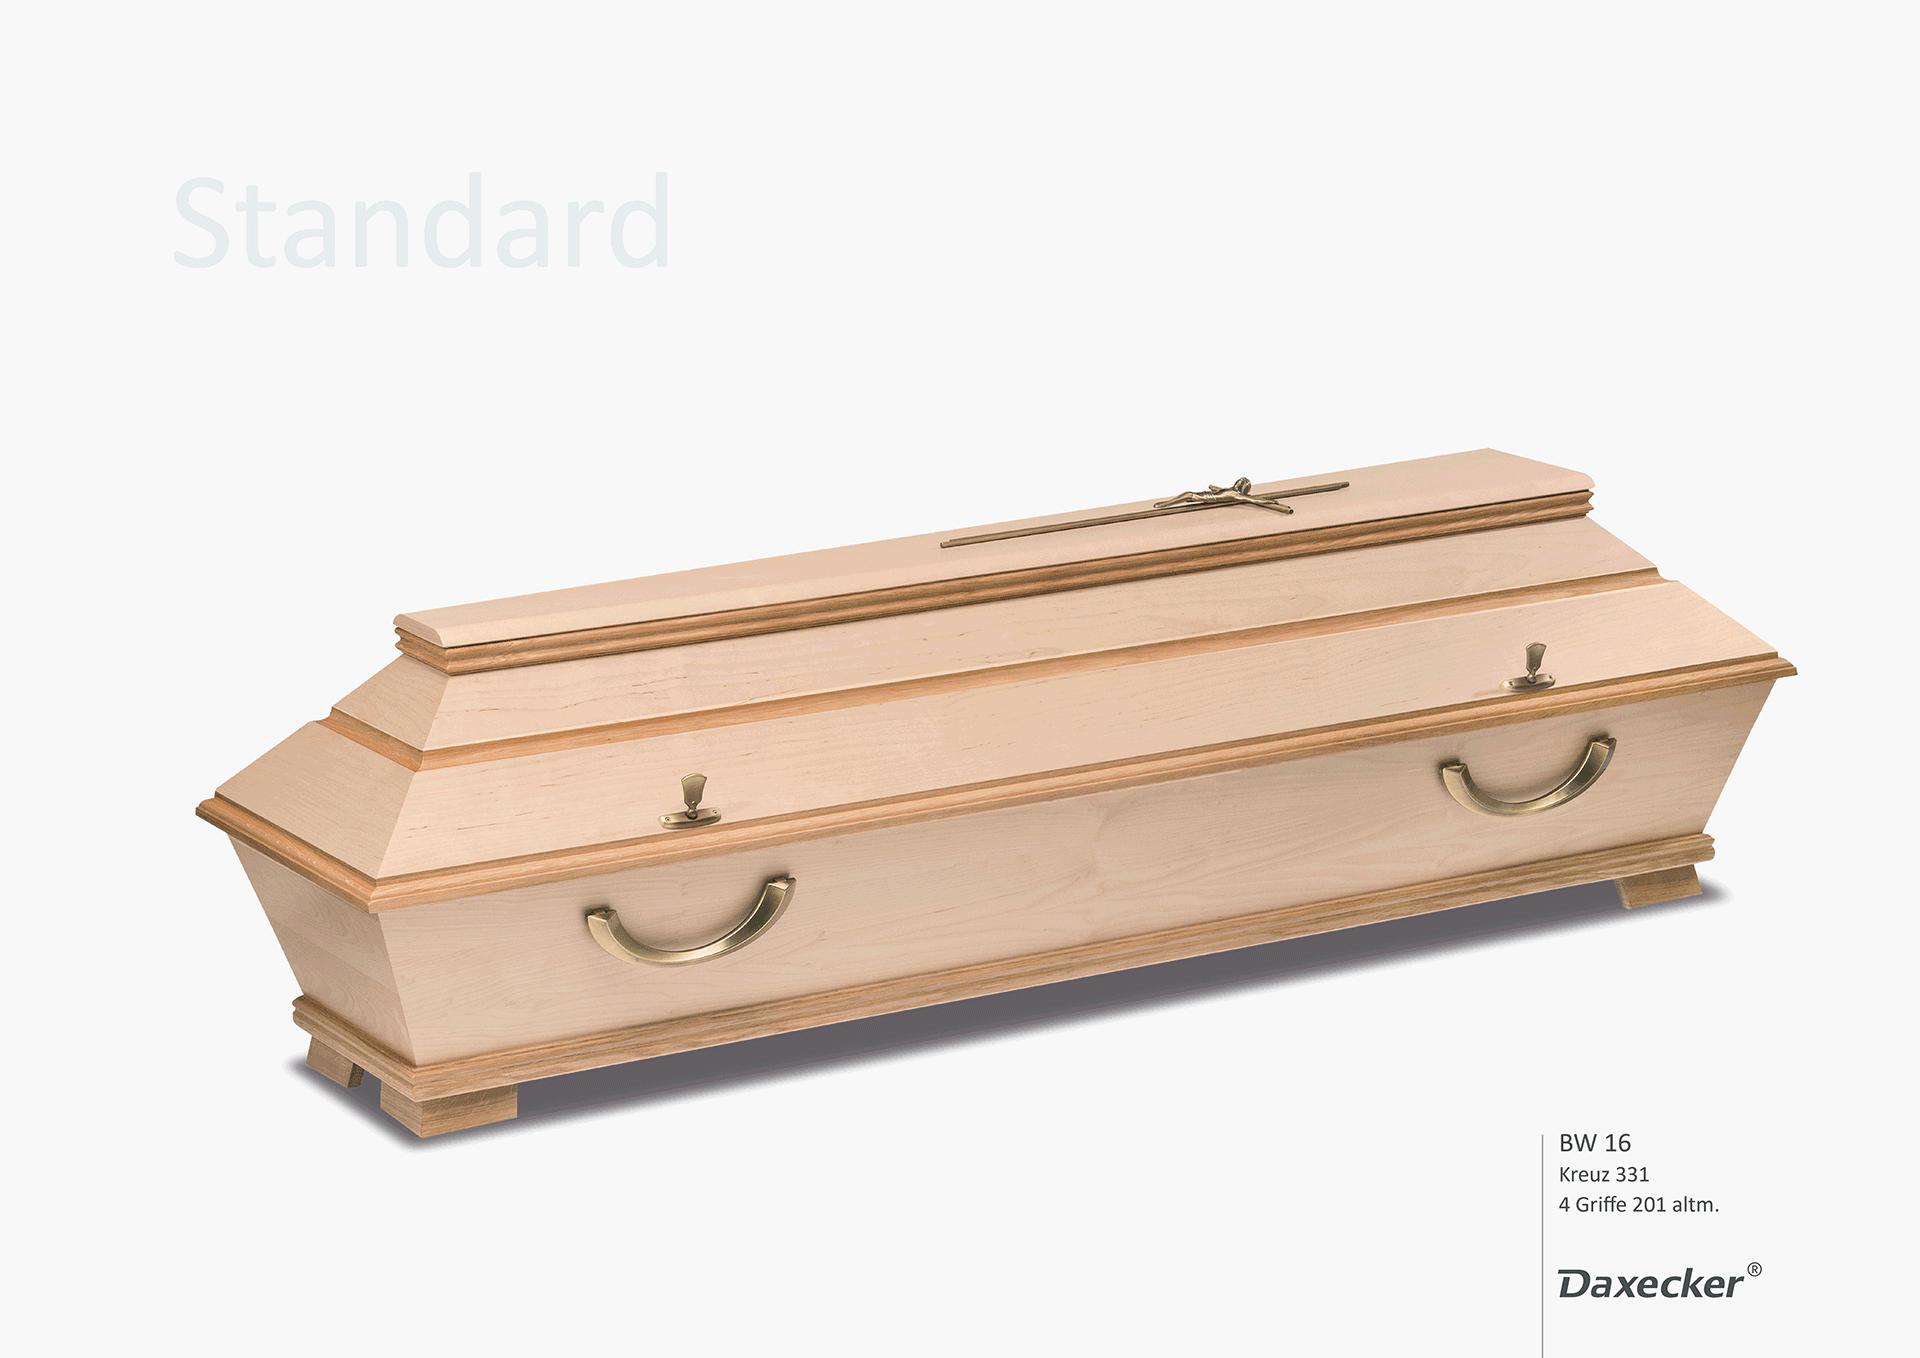 BW 16